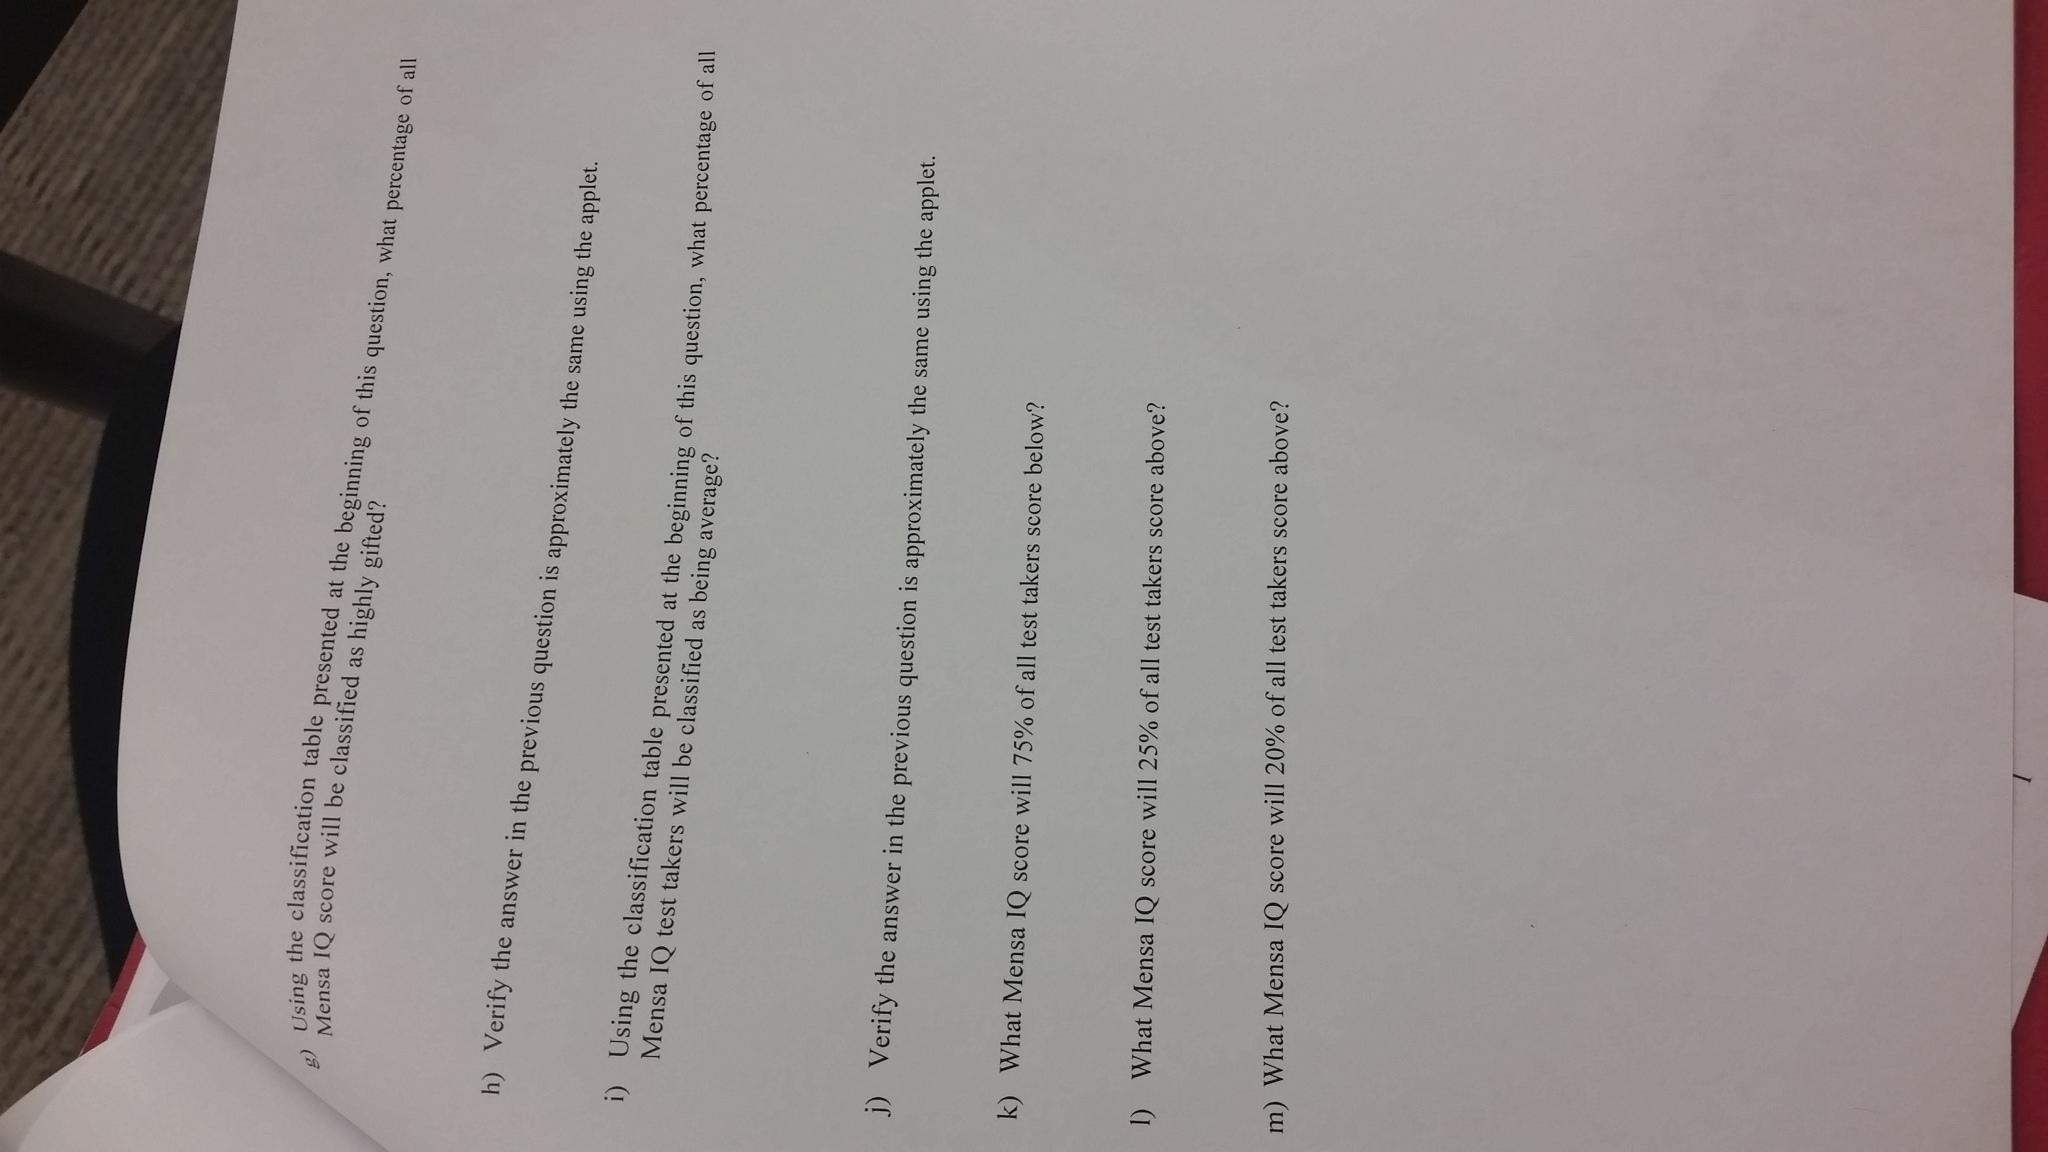 mensa iq test answers pdf